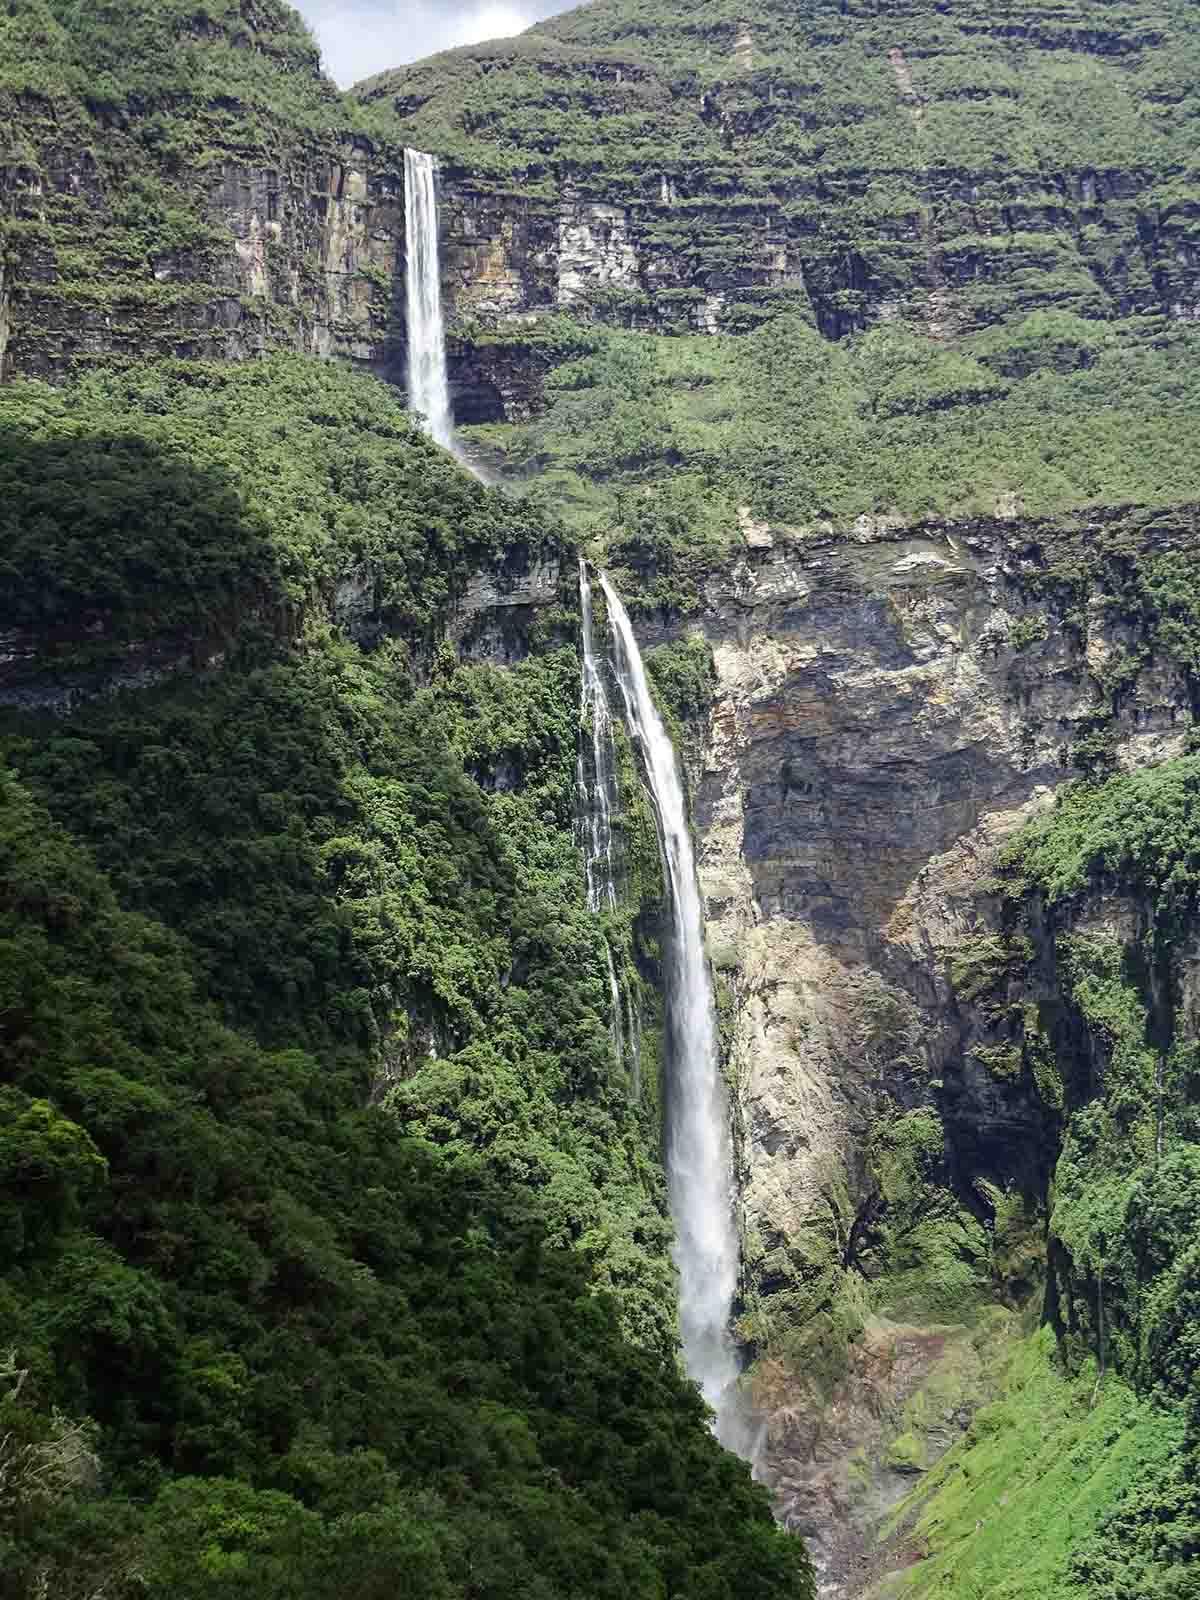 Two drops of one waterfall, the Gocta Waterfall, in Peru.